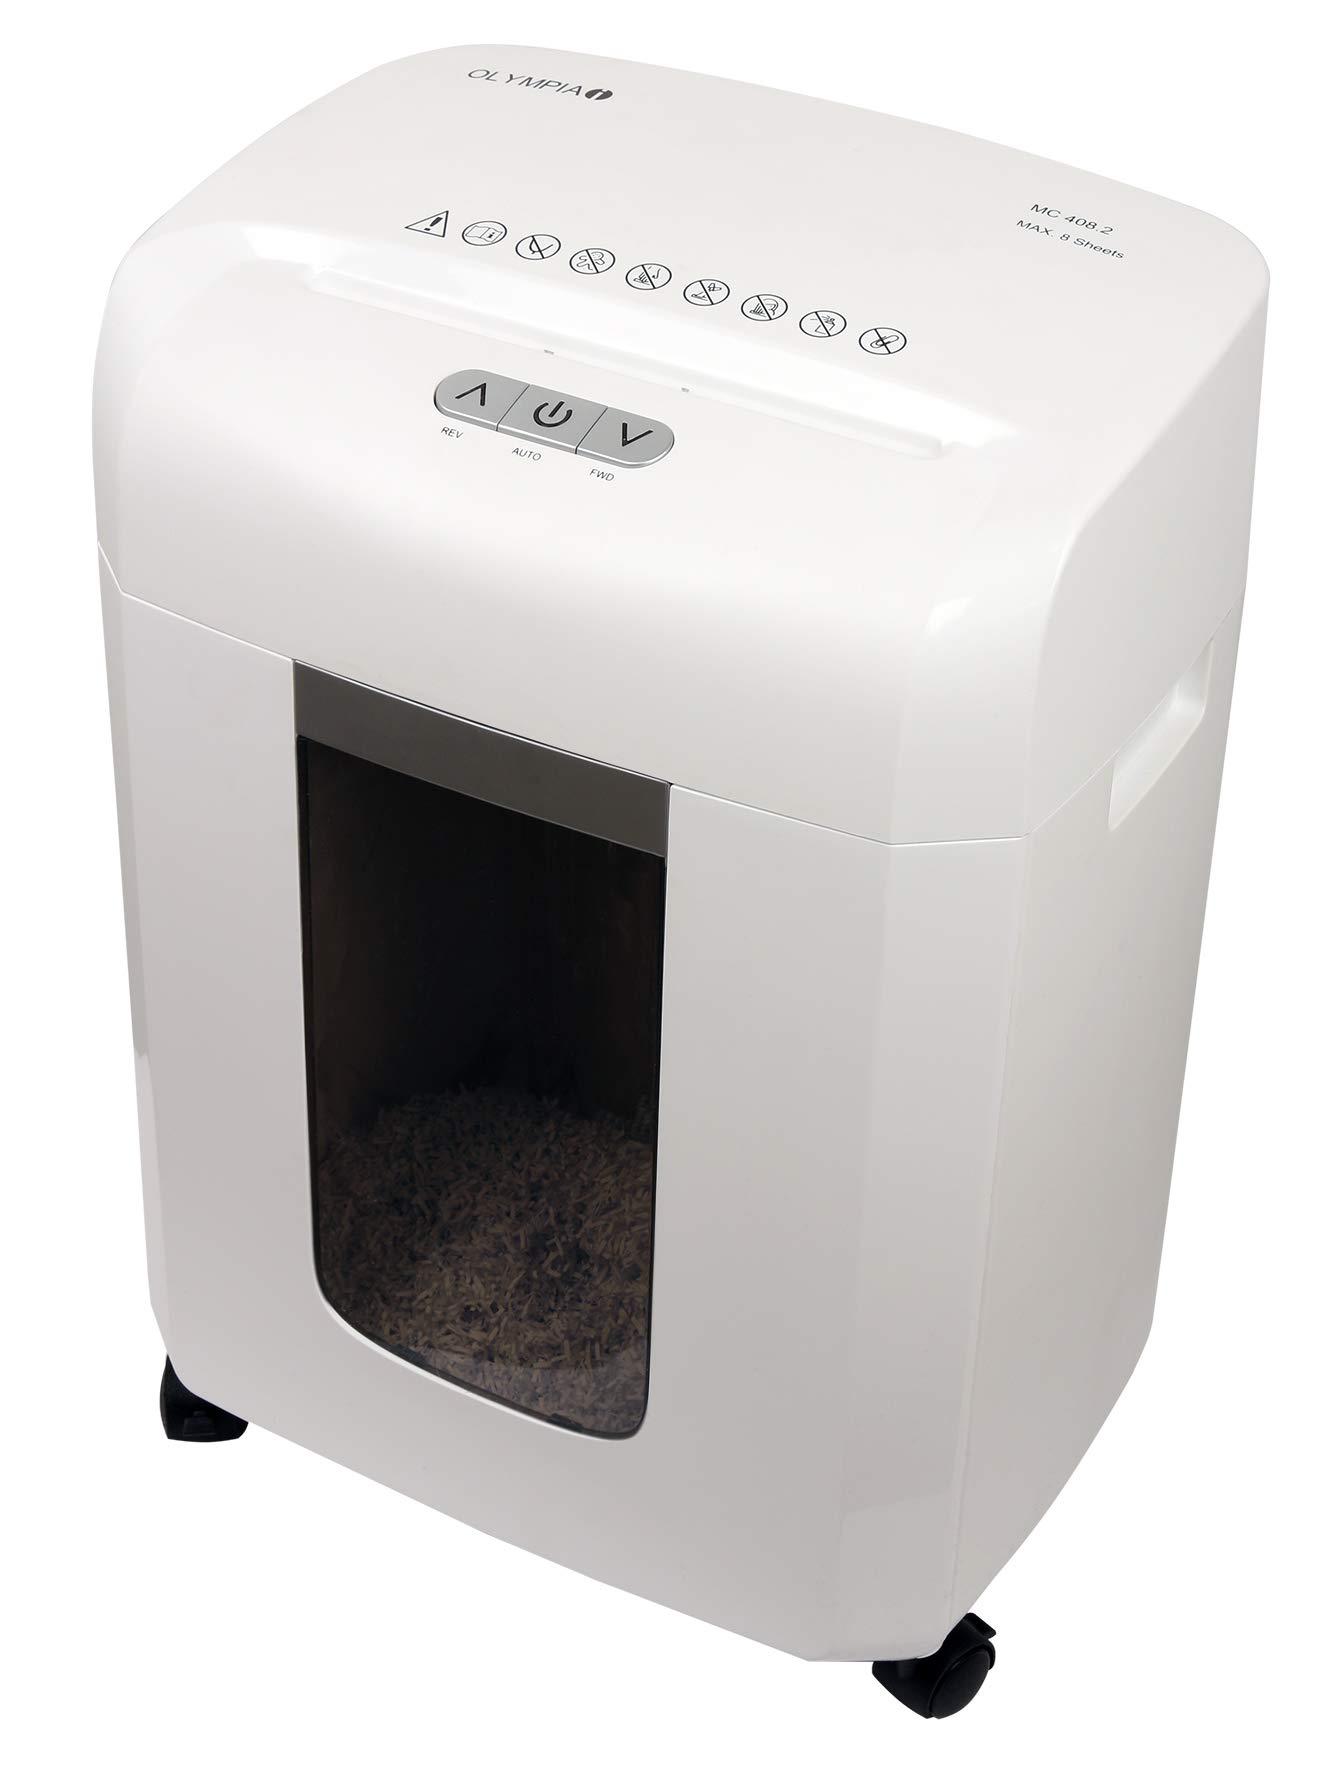 Olympia MC 408.2 Micro-cut shredding, 22 cm, 2 x 15 mm, 16 L, 65 dB, Blanco Triturador de papel